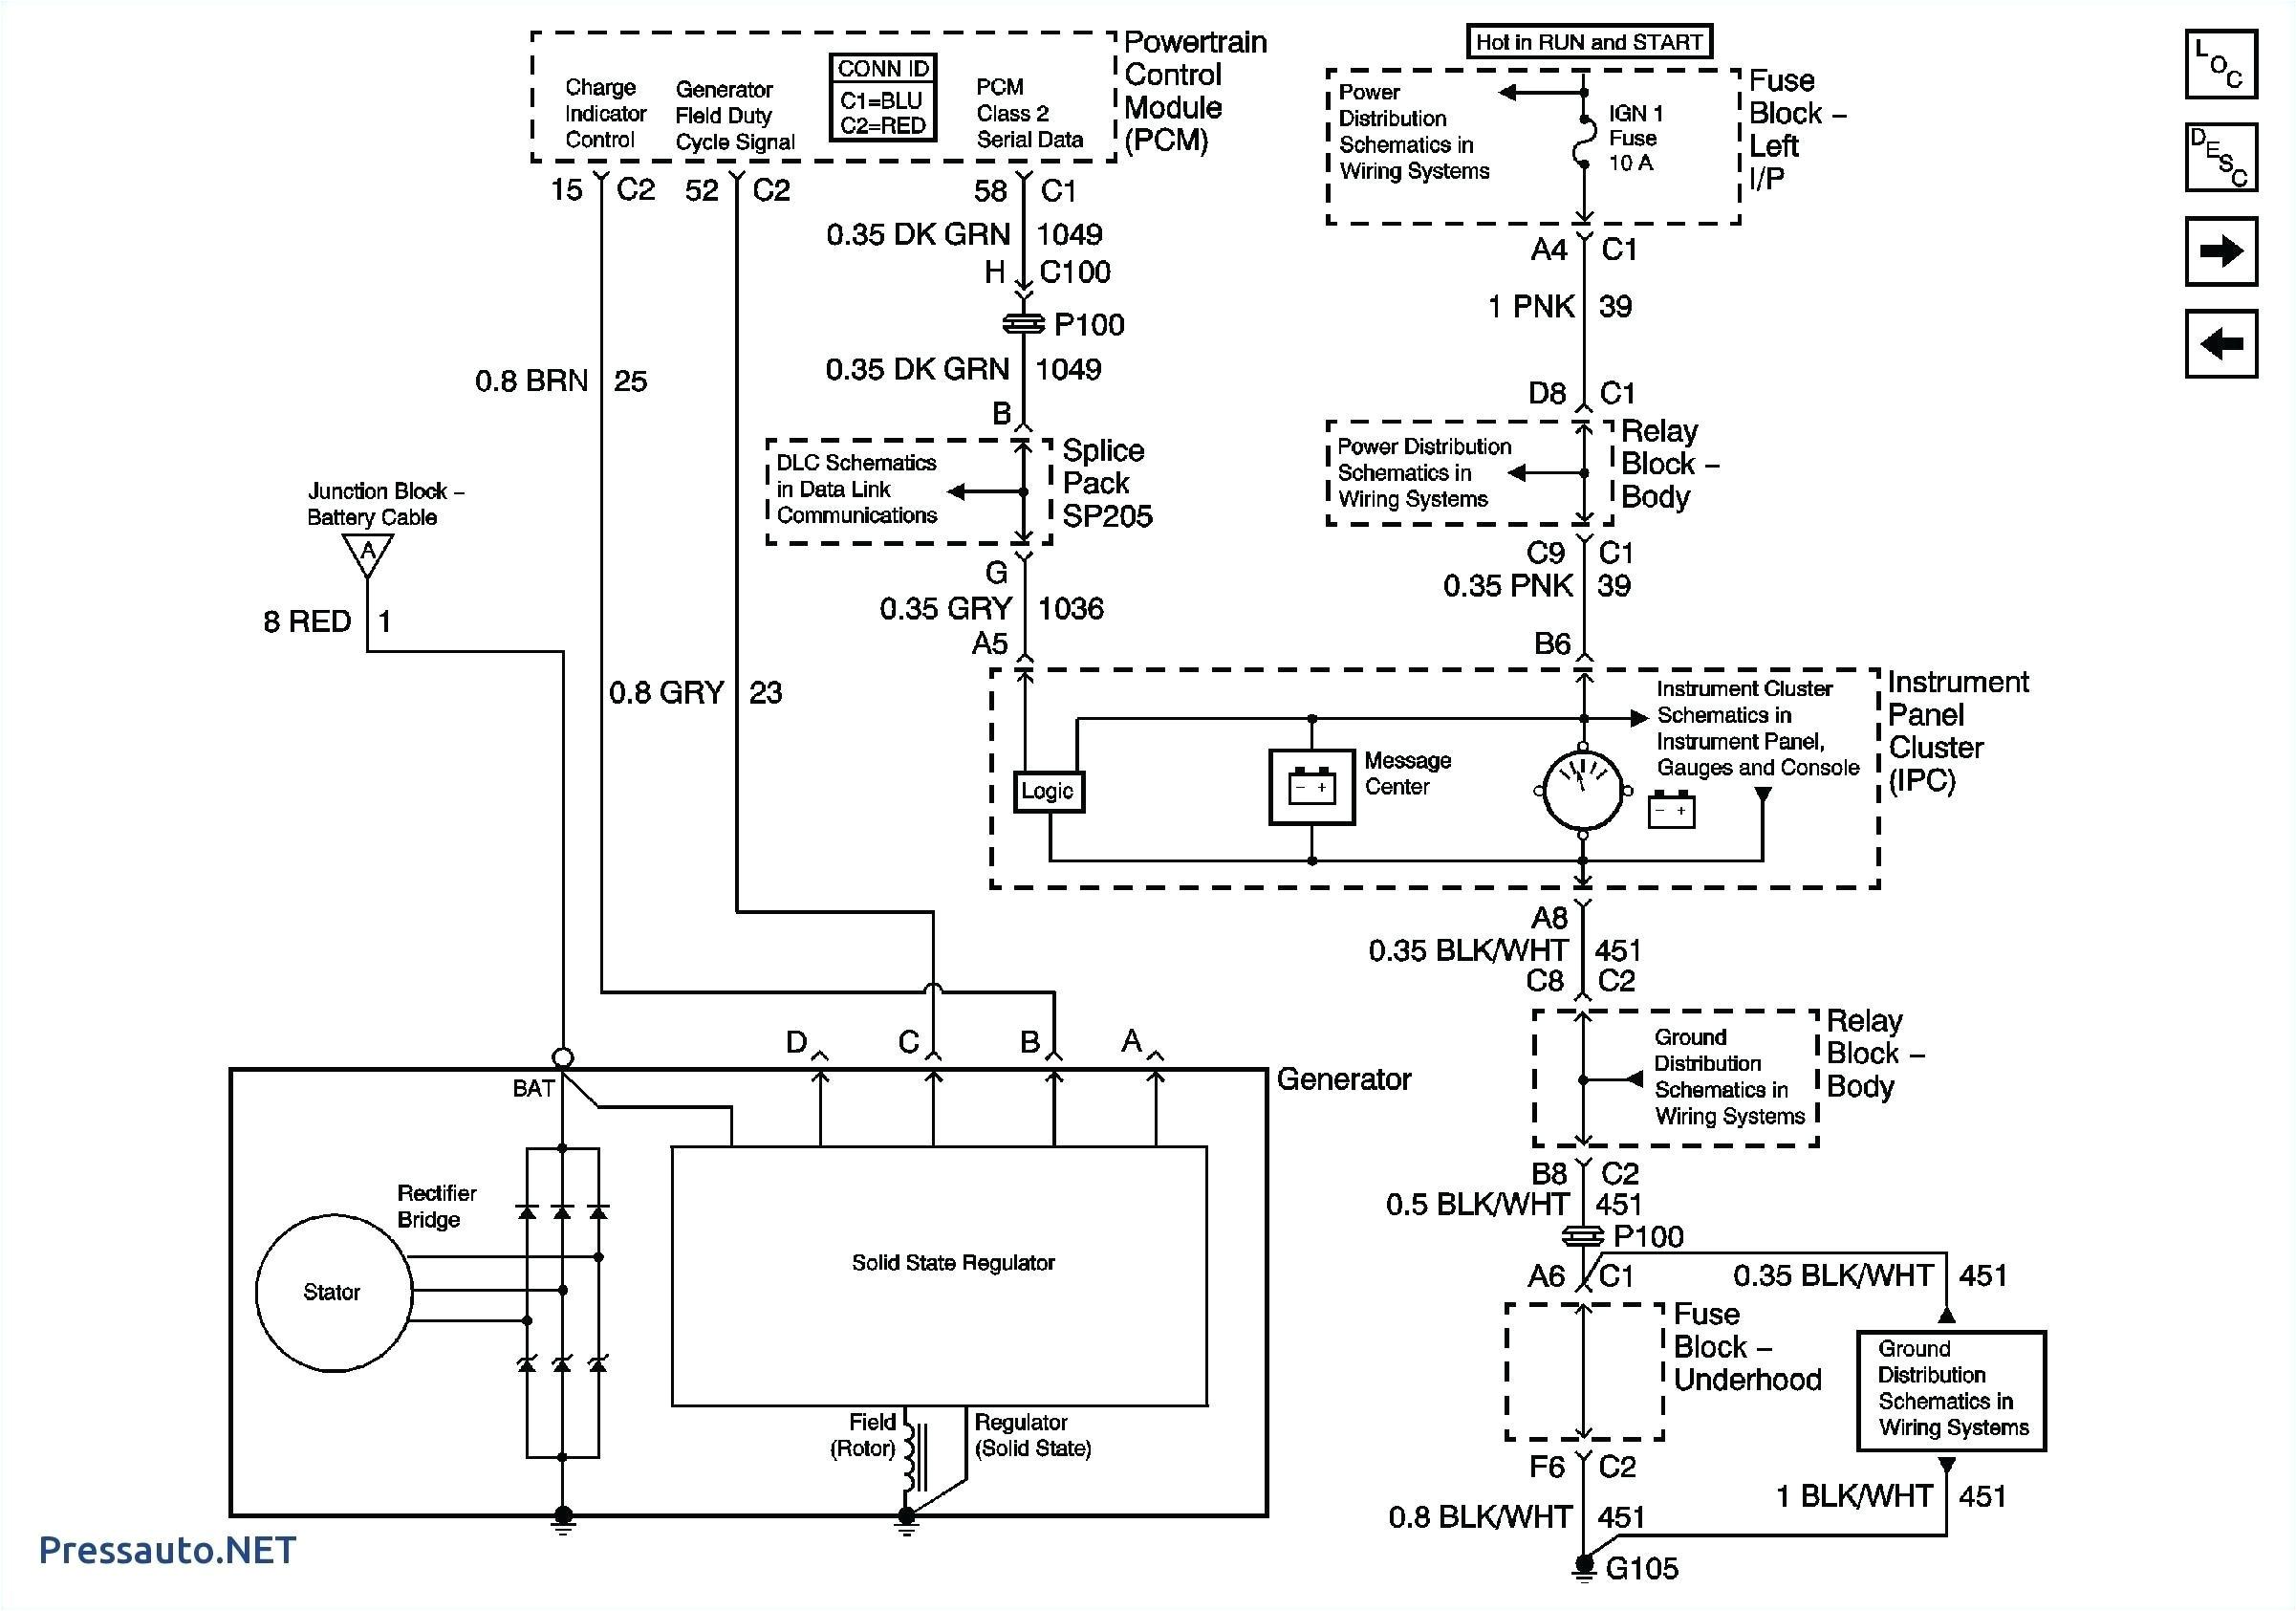 Charging Alternator Wiring Diagram Ach Wiring Diagram Model 8 Blog Wiring Diagram